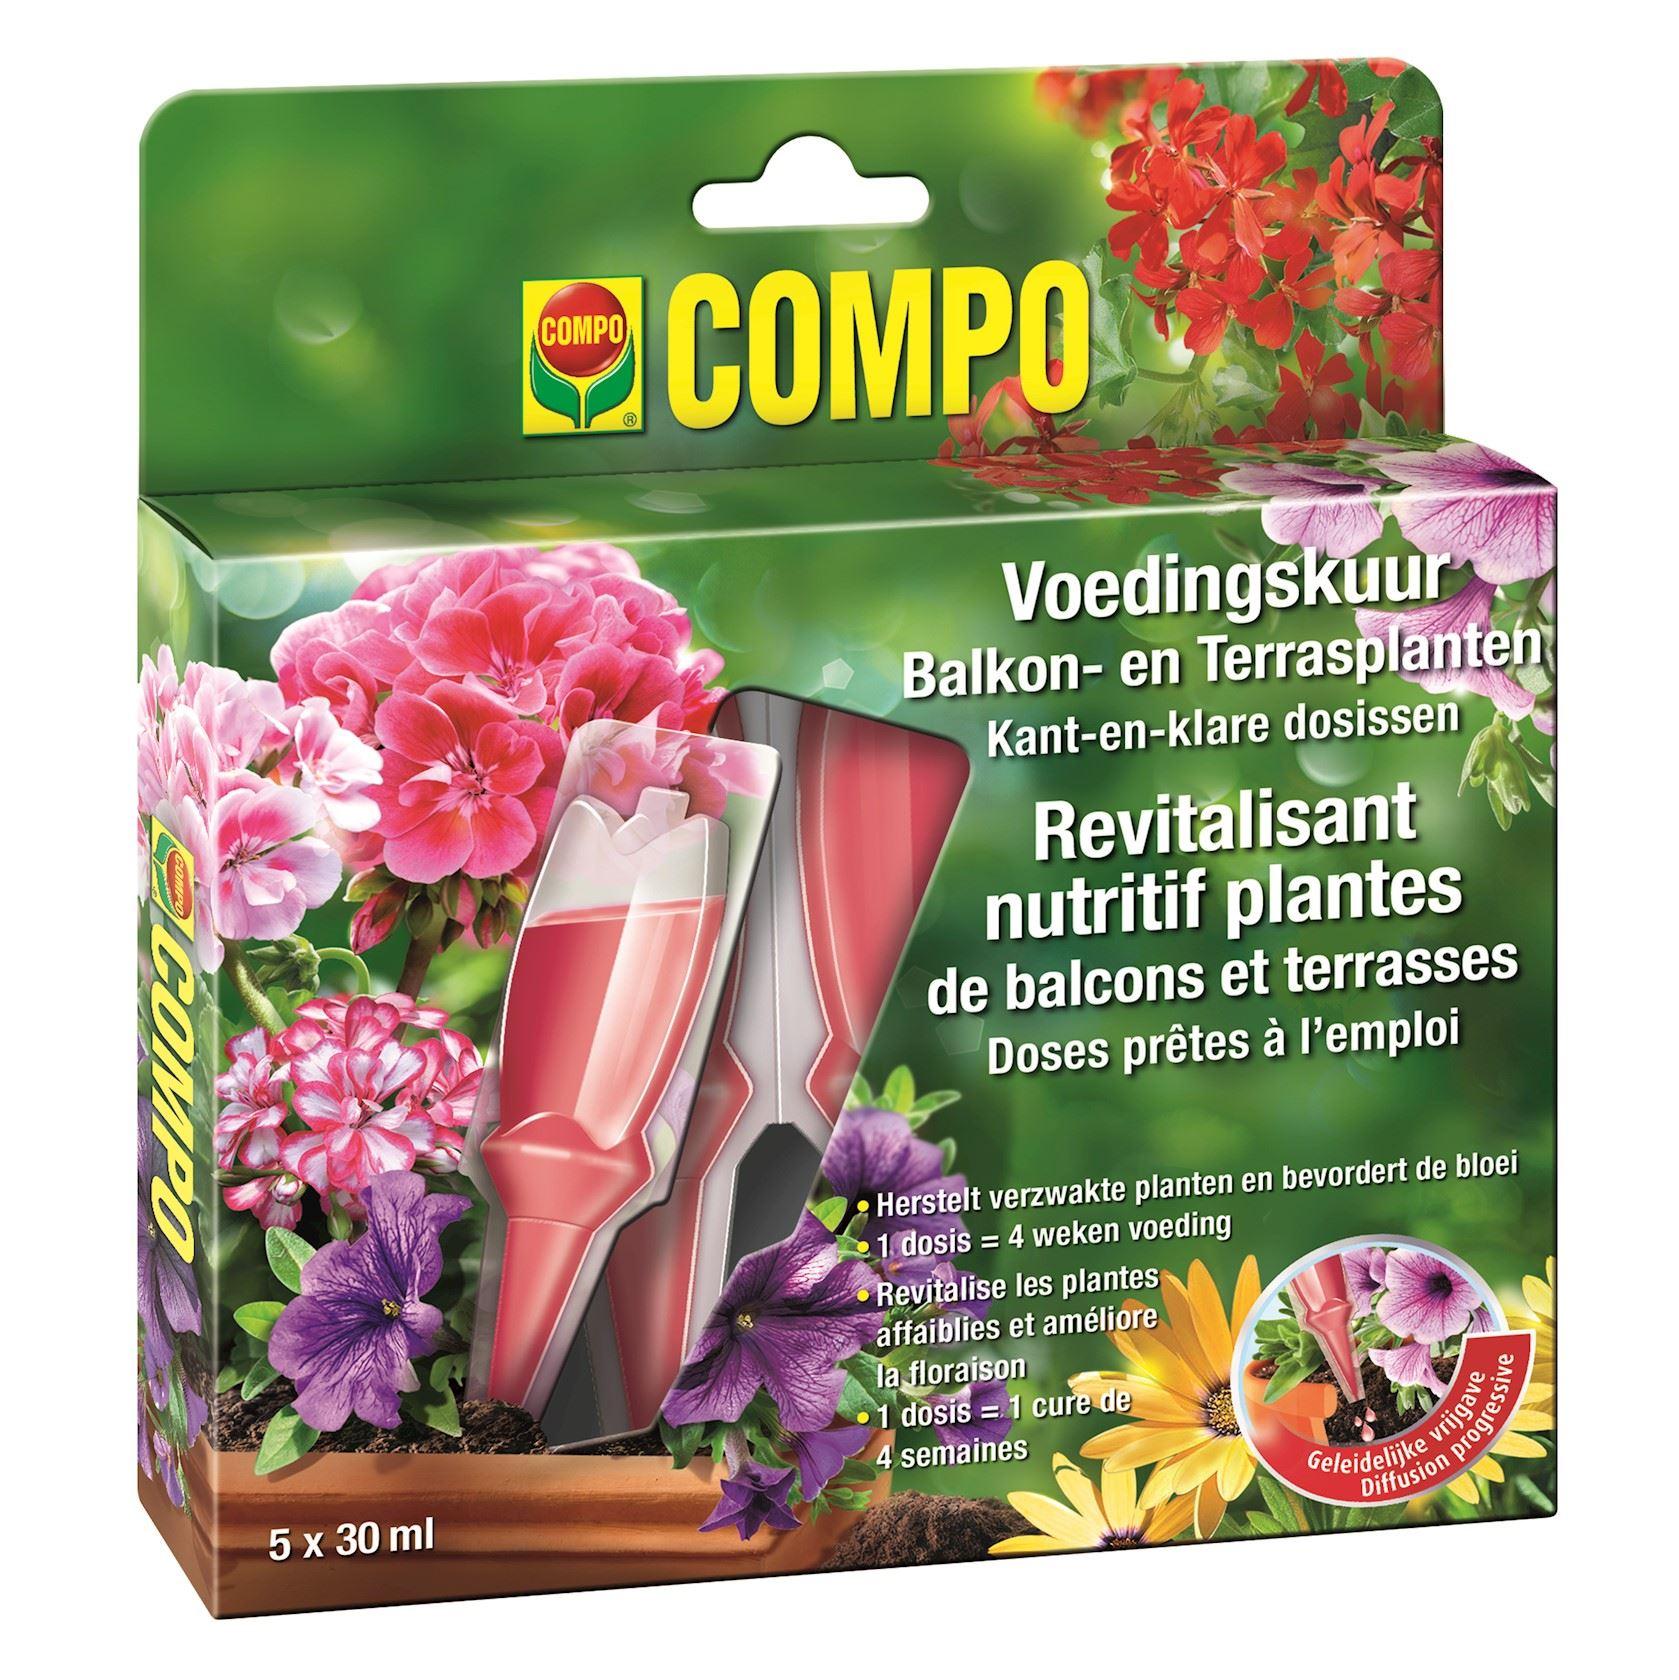 Compo voedingskuur balkonplanten - 150ml (5x30ml)